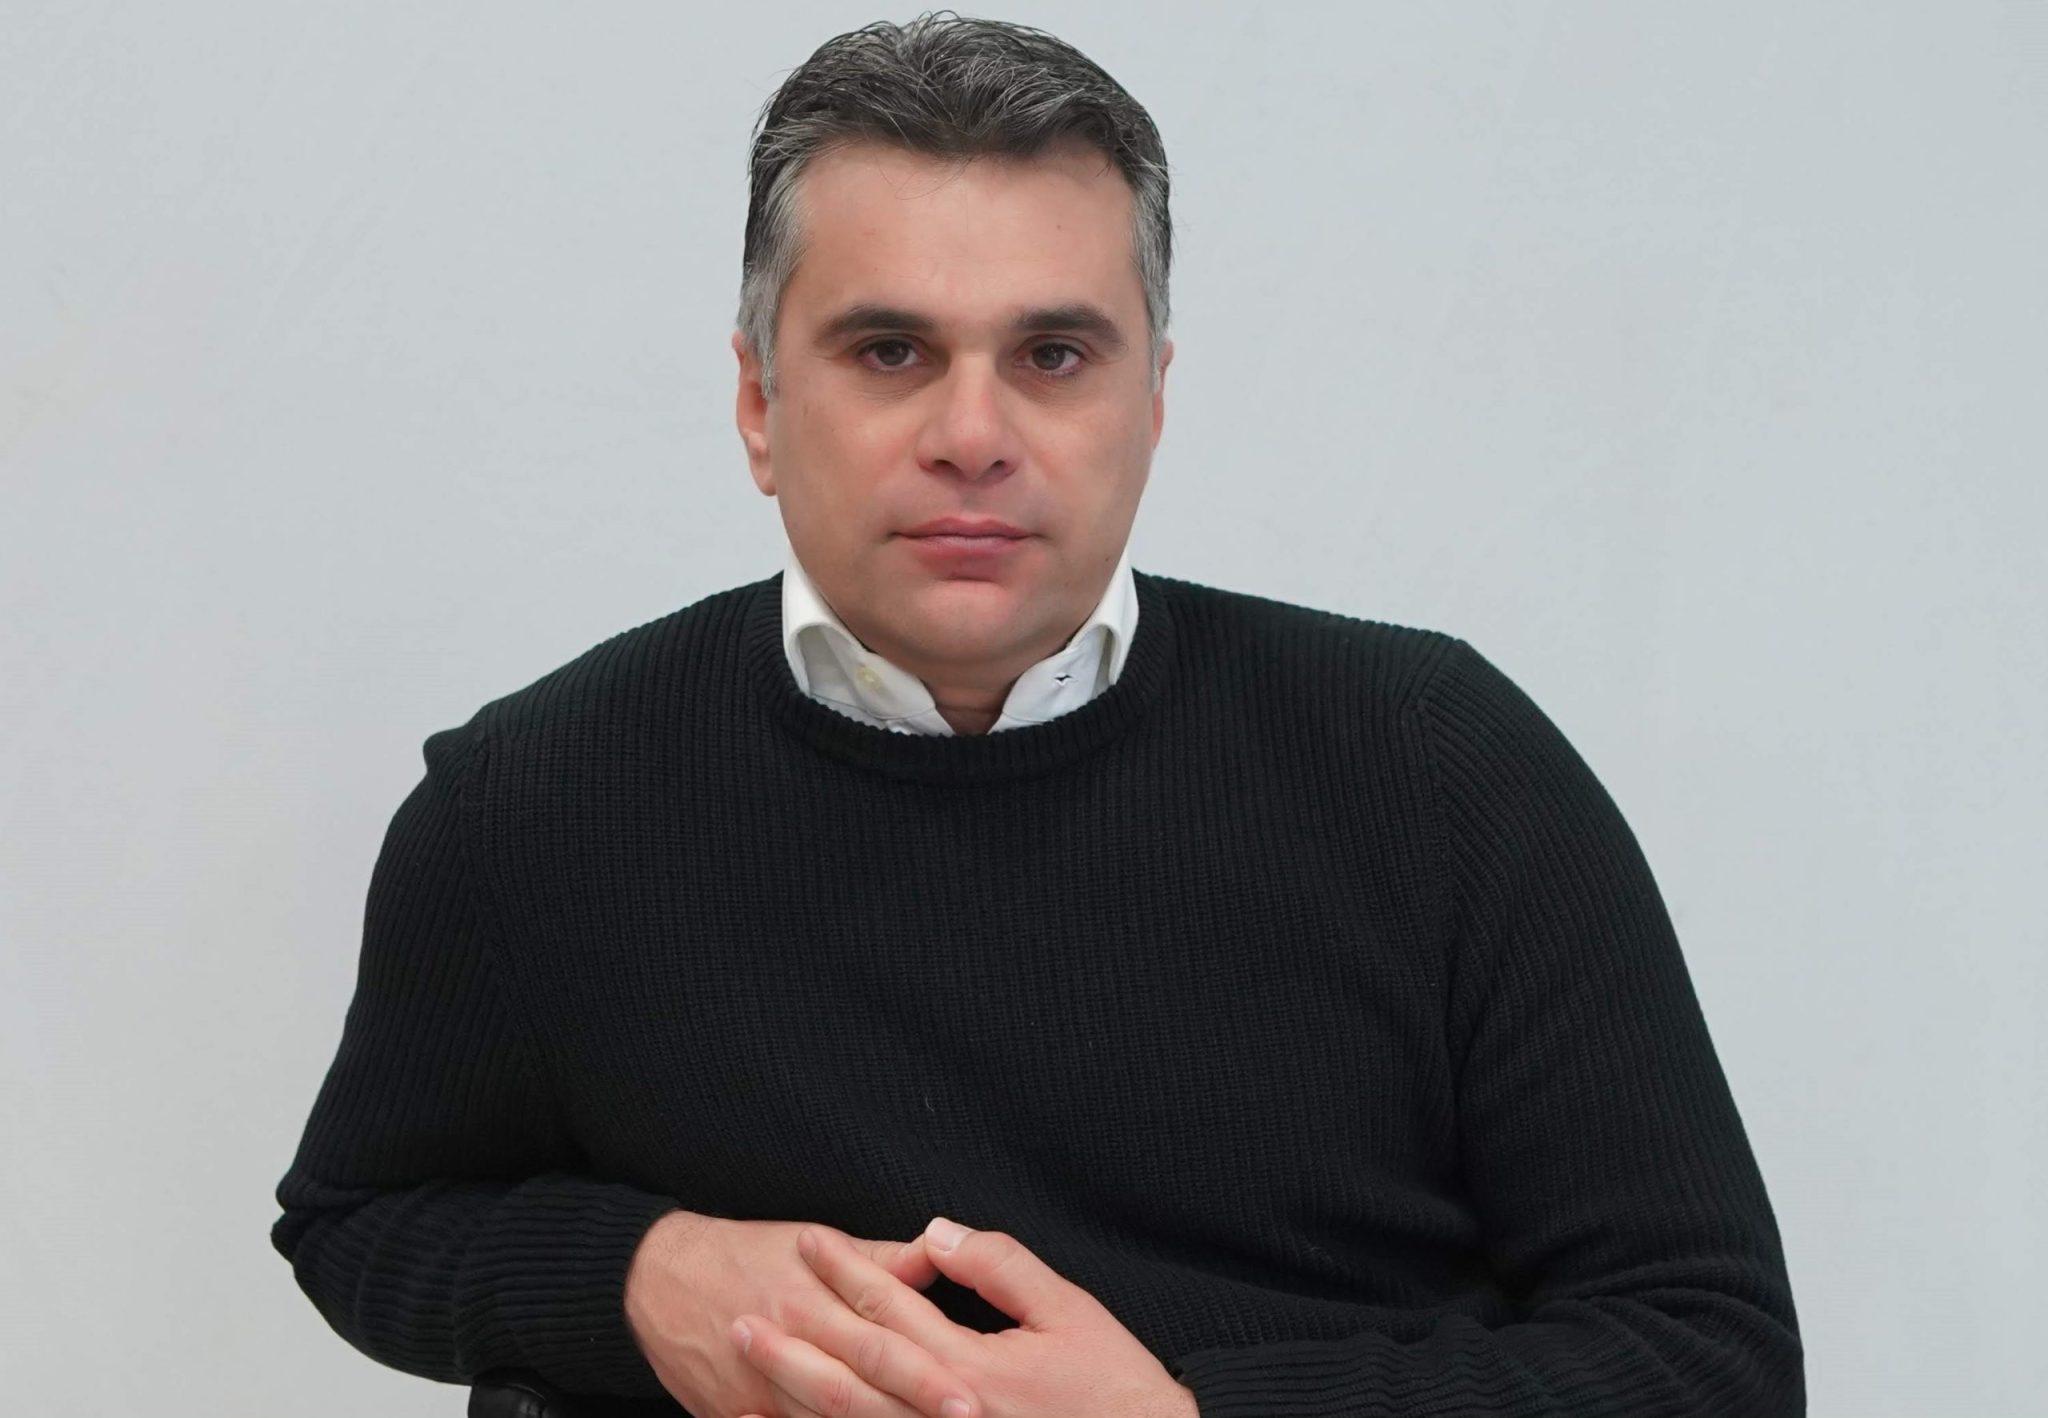 neri presidente consiglio regionale